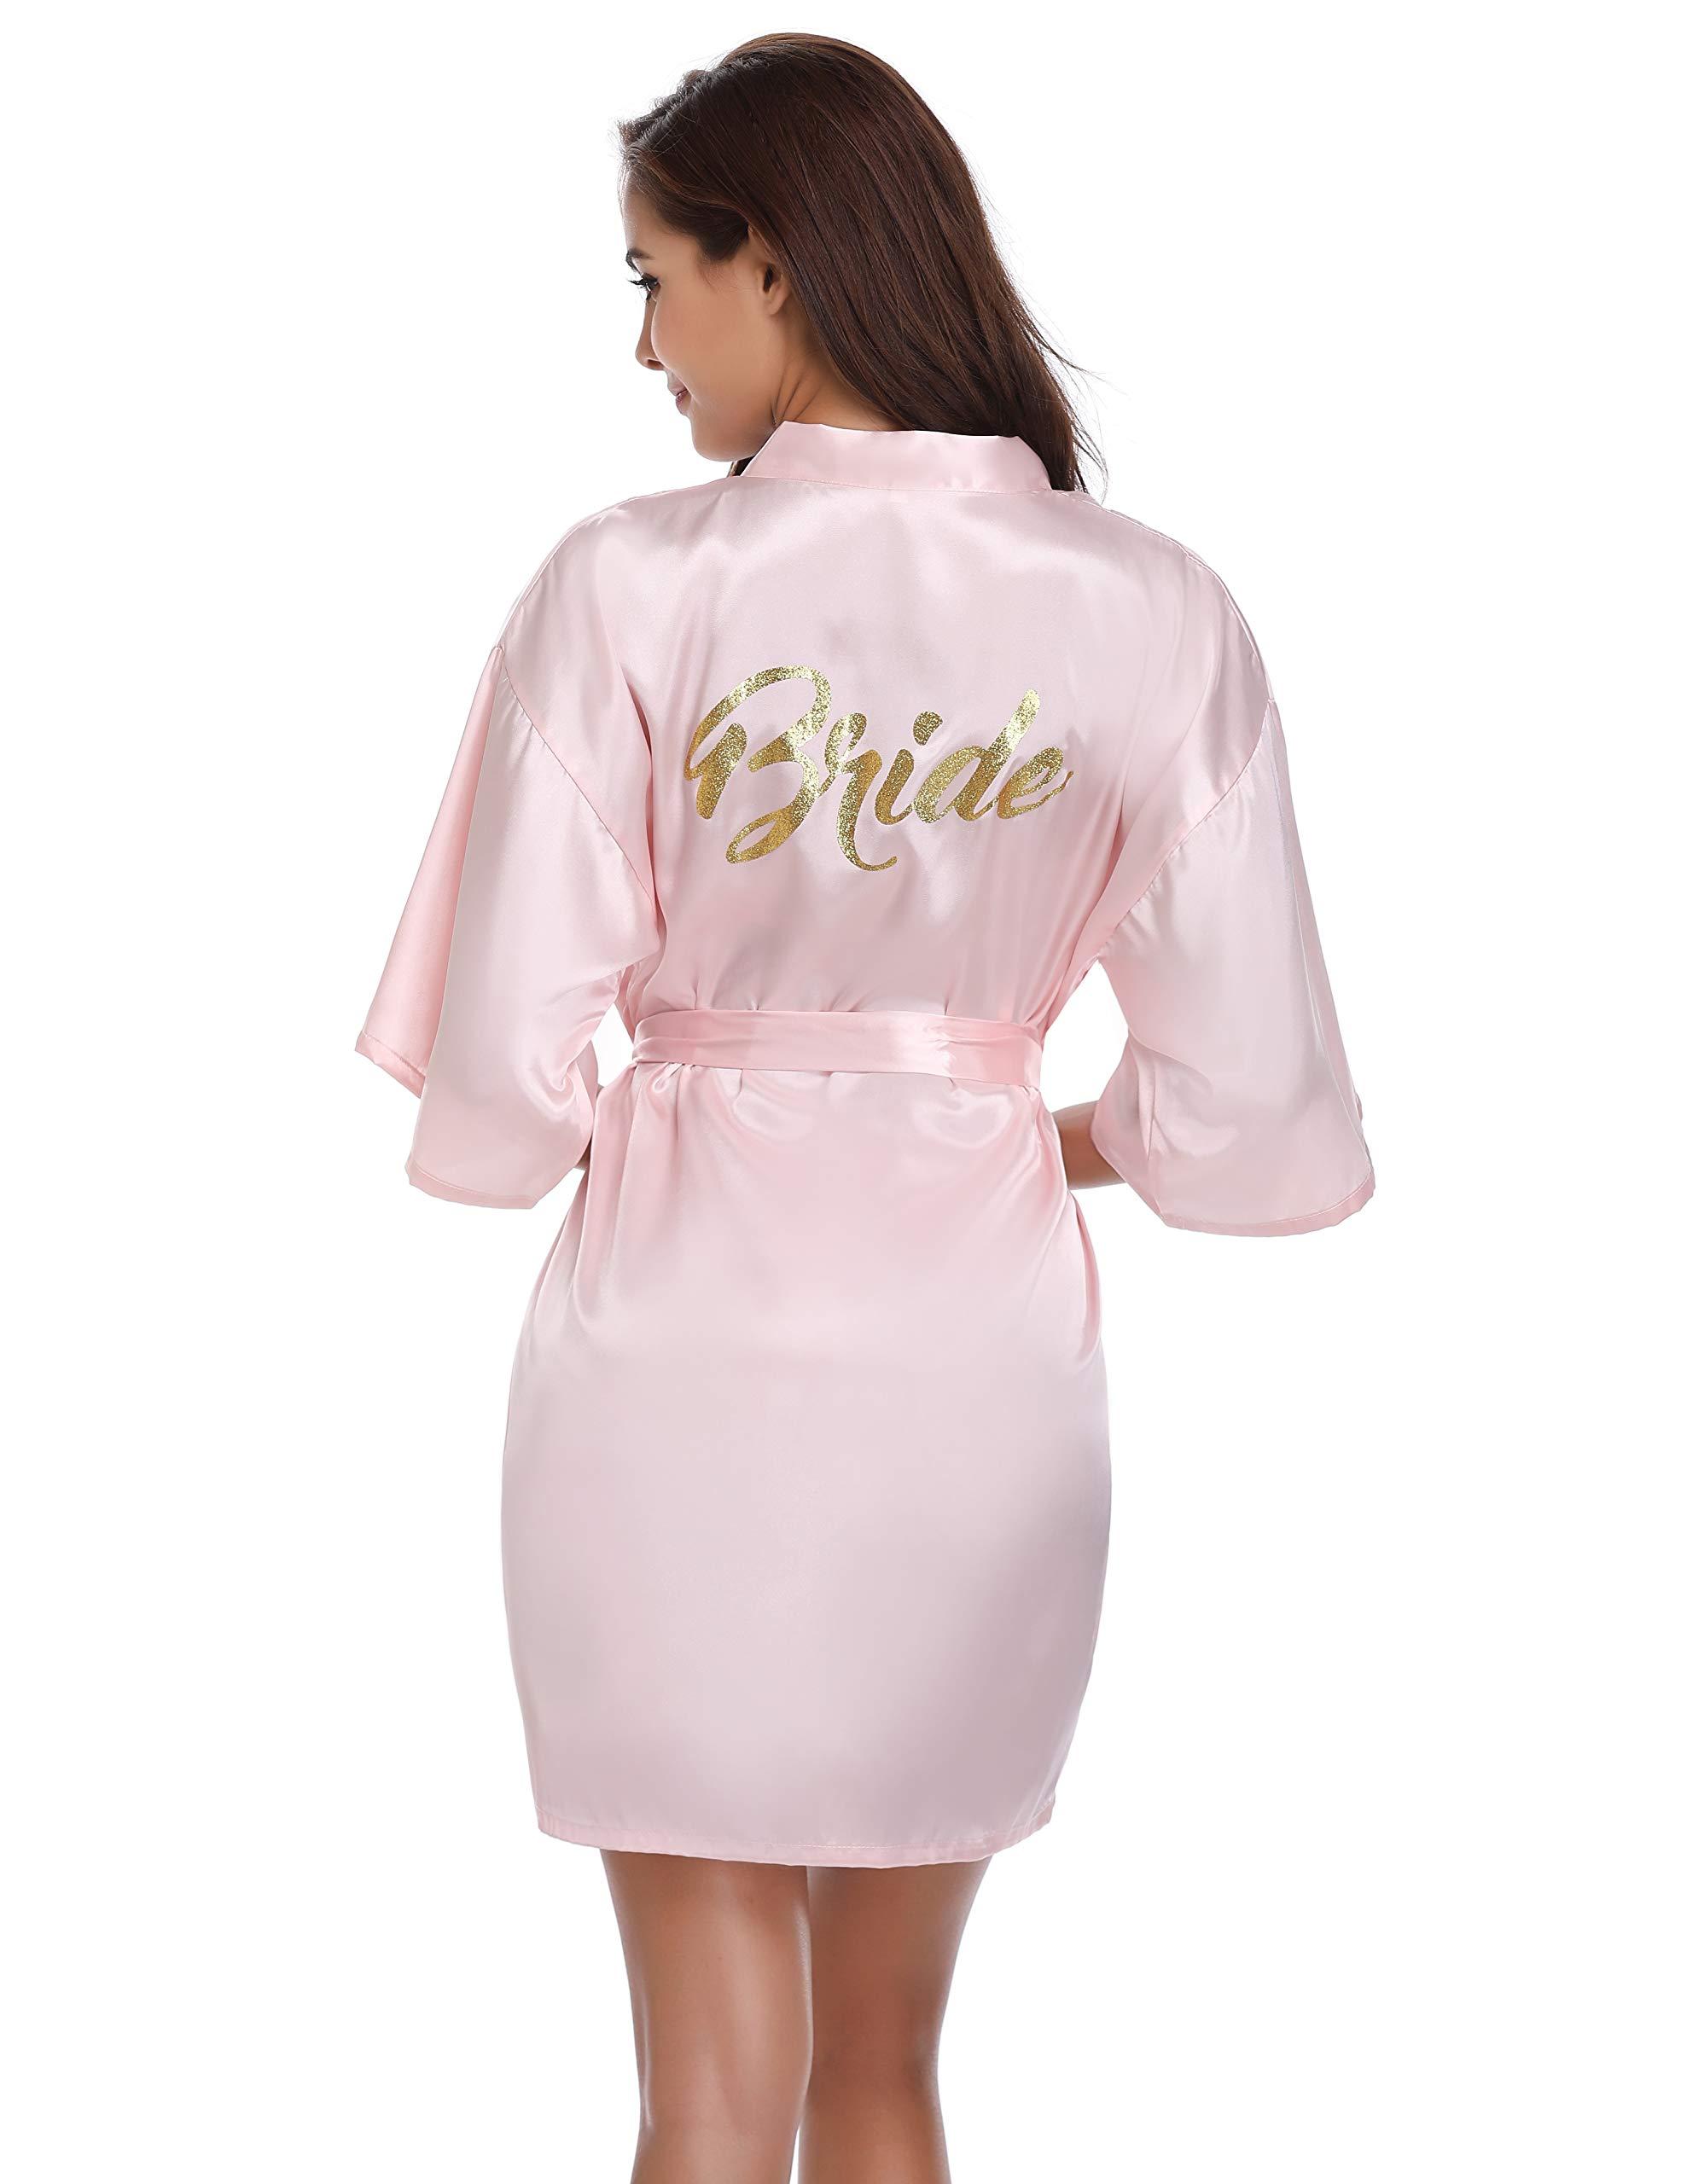 Vlazom Bridal Bridesmaid Robes Silk Bride Party Robes Dressing Gwon, Wedding Day Robes, Glitter Bridesmaid Kimono Bathrobe